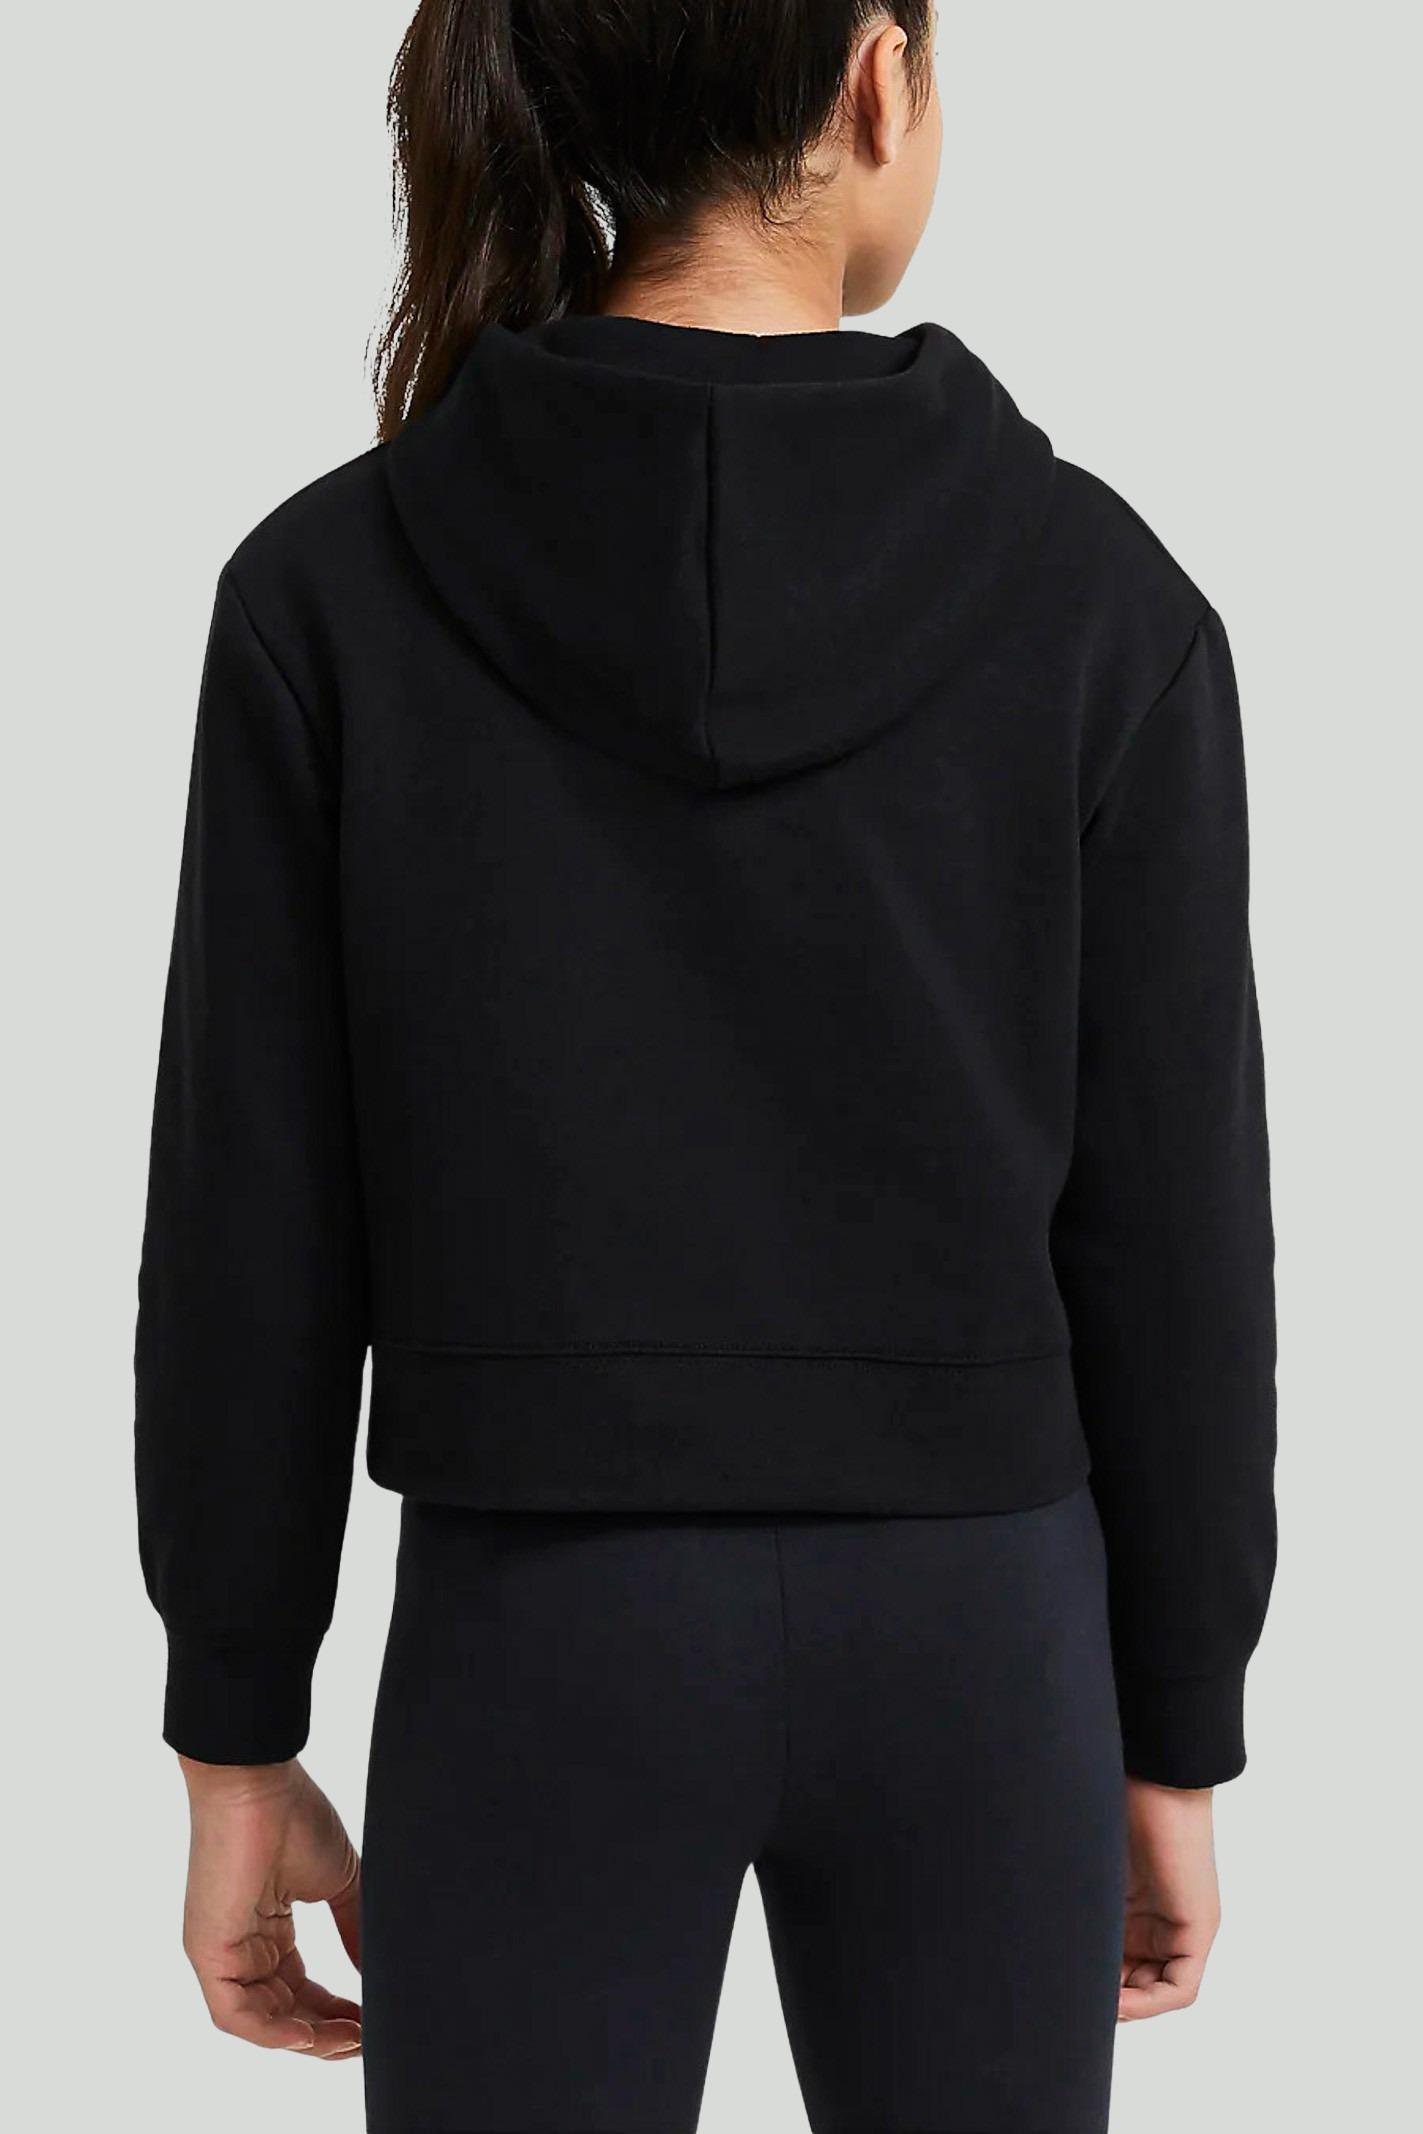 Black hoodie with maxi logo on the front. Baby model. Brand: Nike-Jordan NIKE | Sweatshirt | 45A442-023023